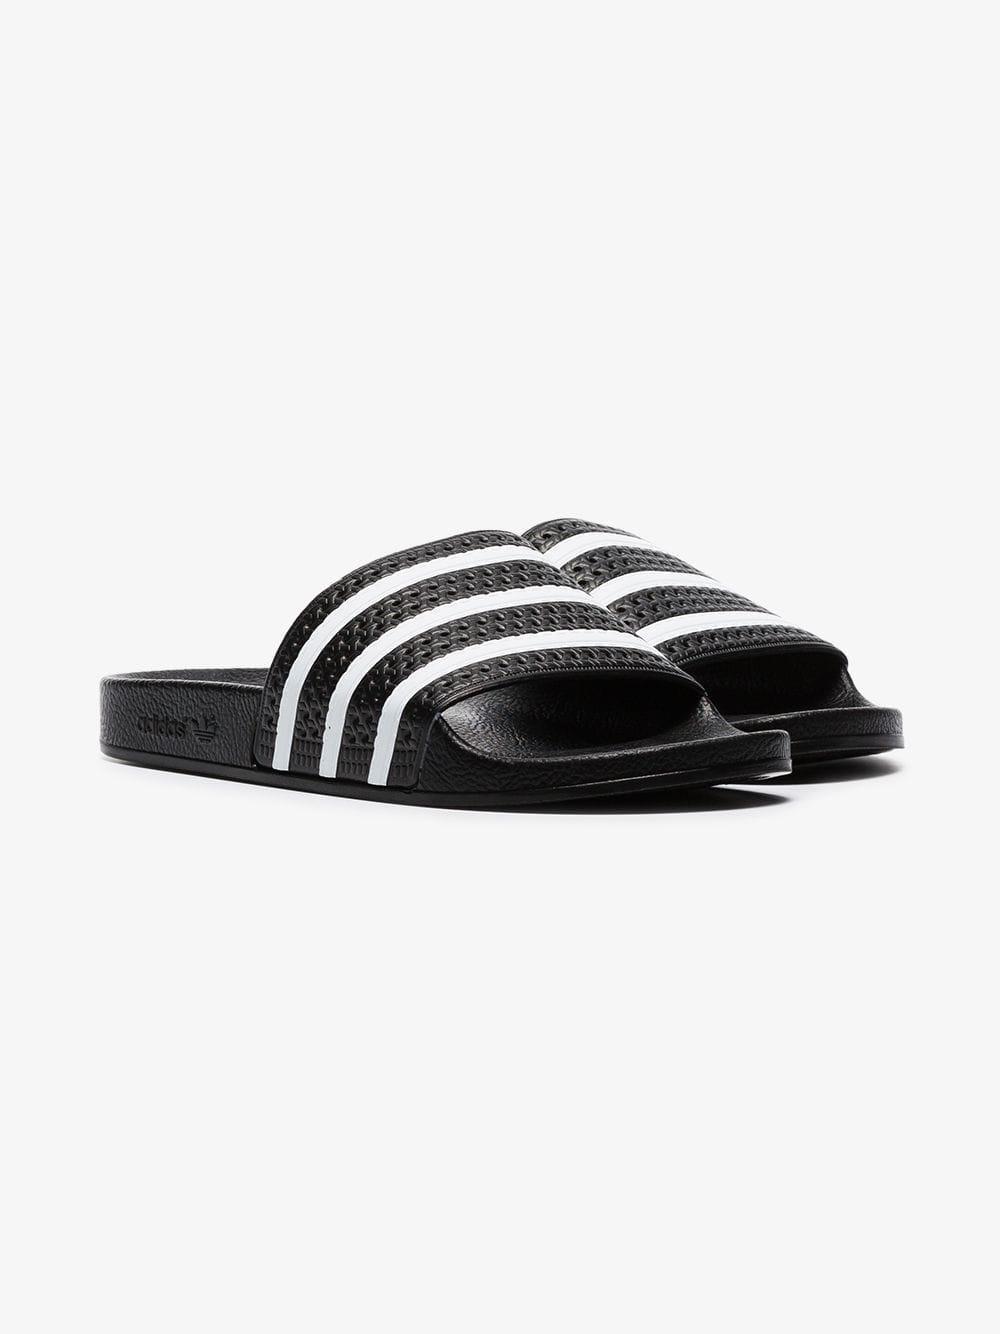 1af200803ea87f Adidas - Black And White Adilette Slides for Men - Lyst. View fullscreen